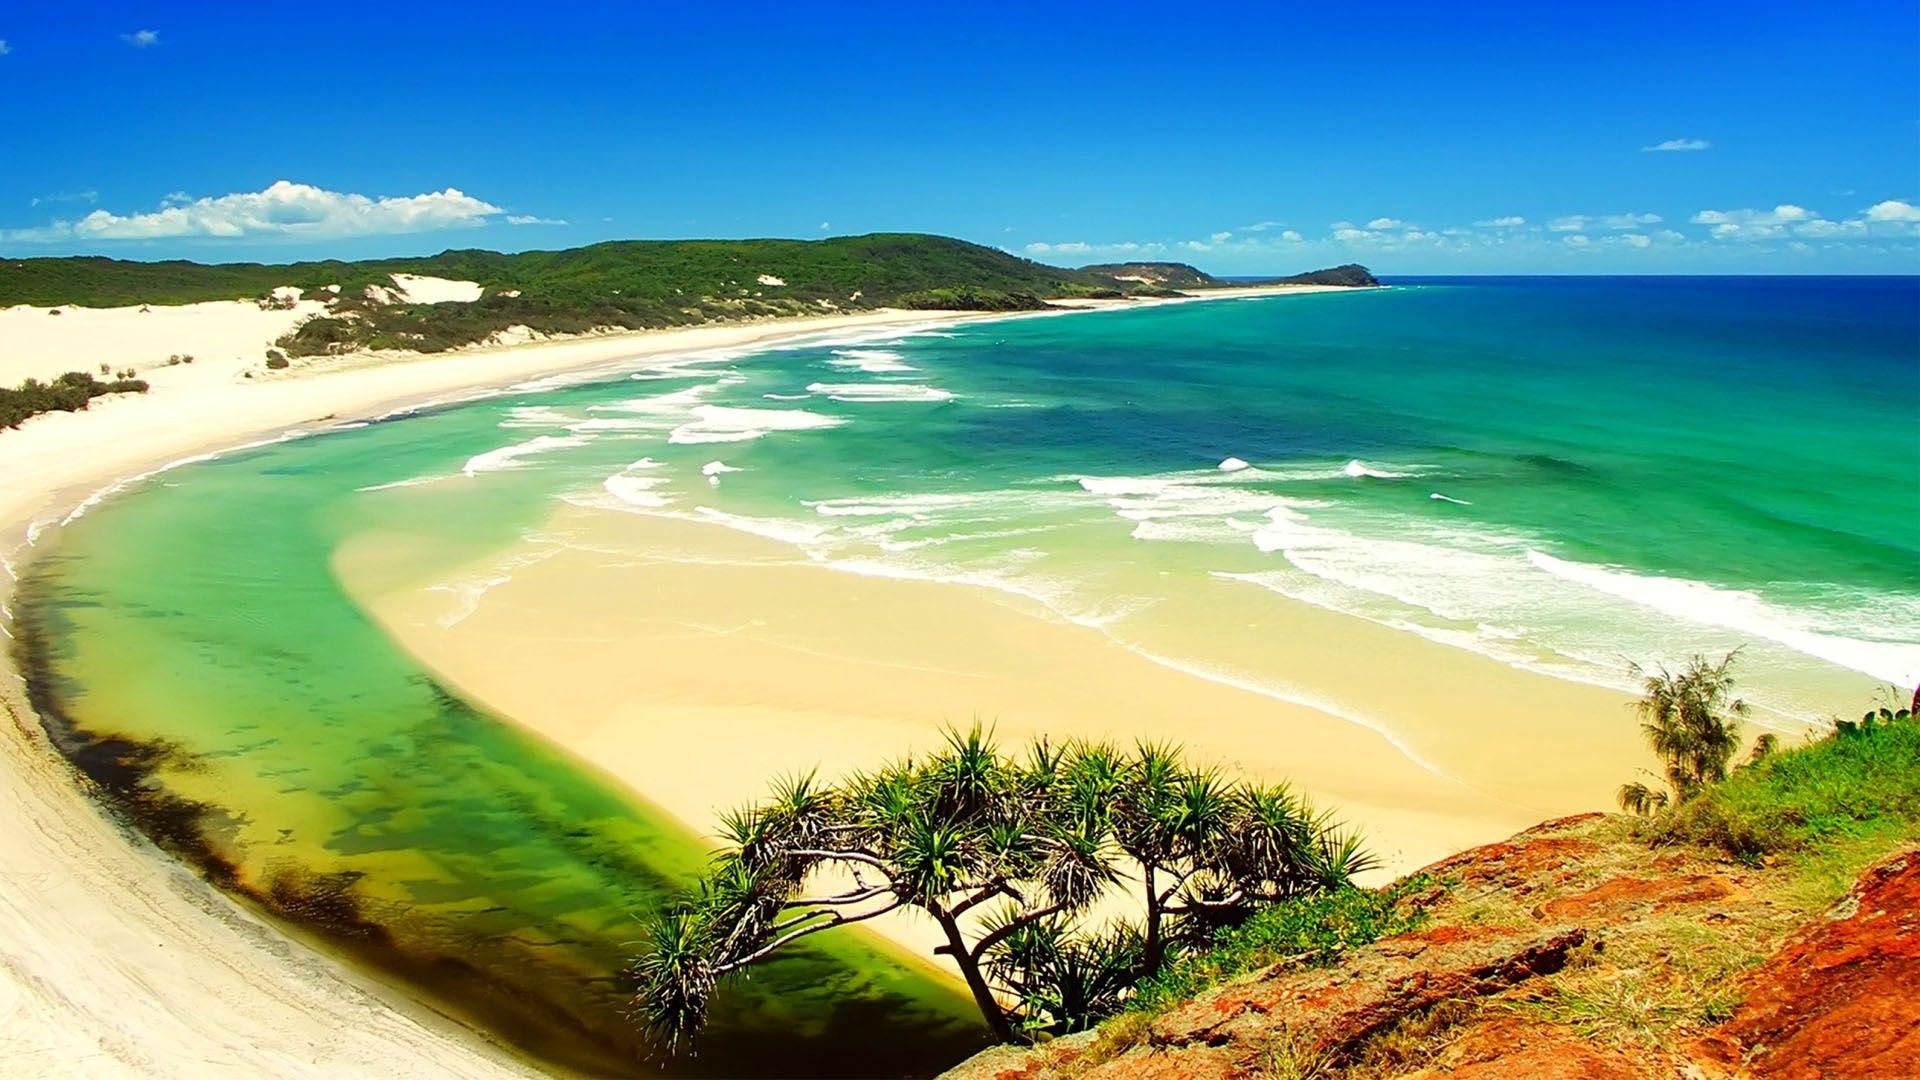 Beach Desktop Wallpaper Widescreen: Summer Pictures For Desktop